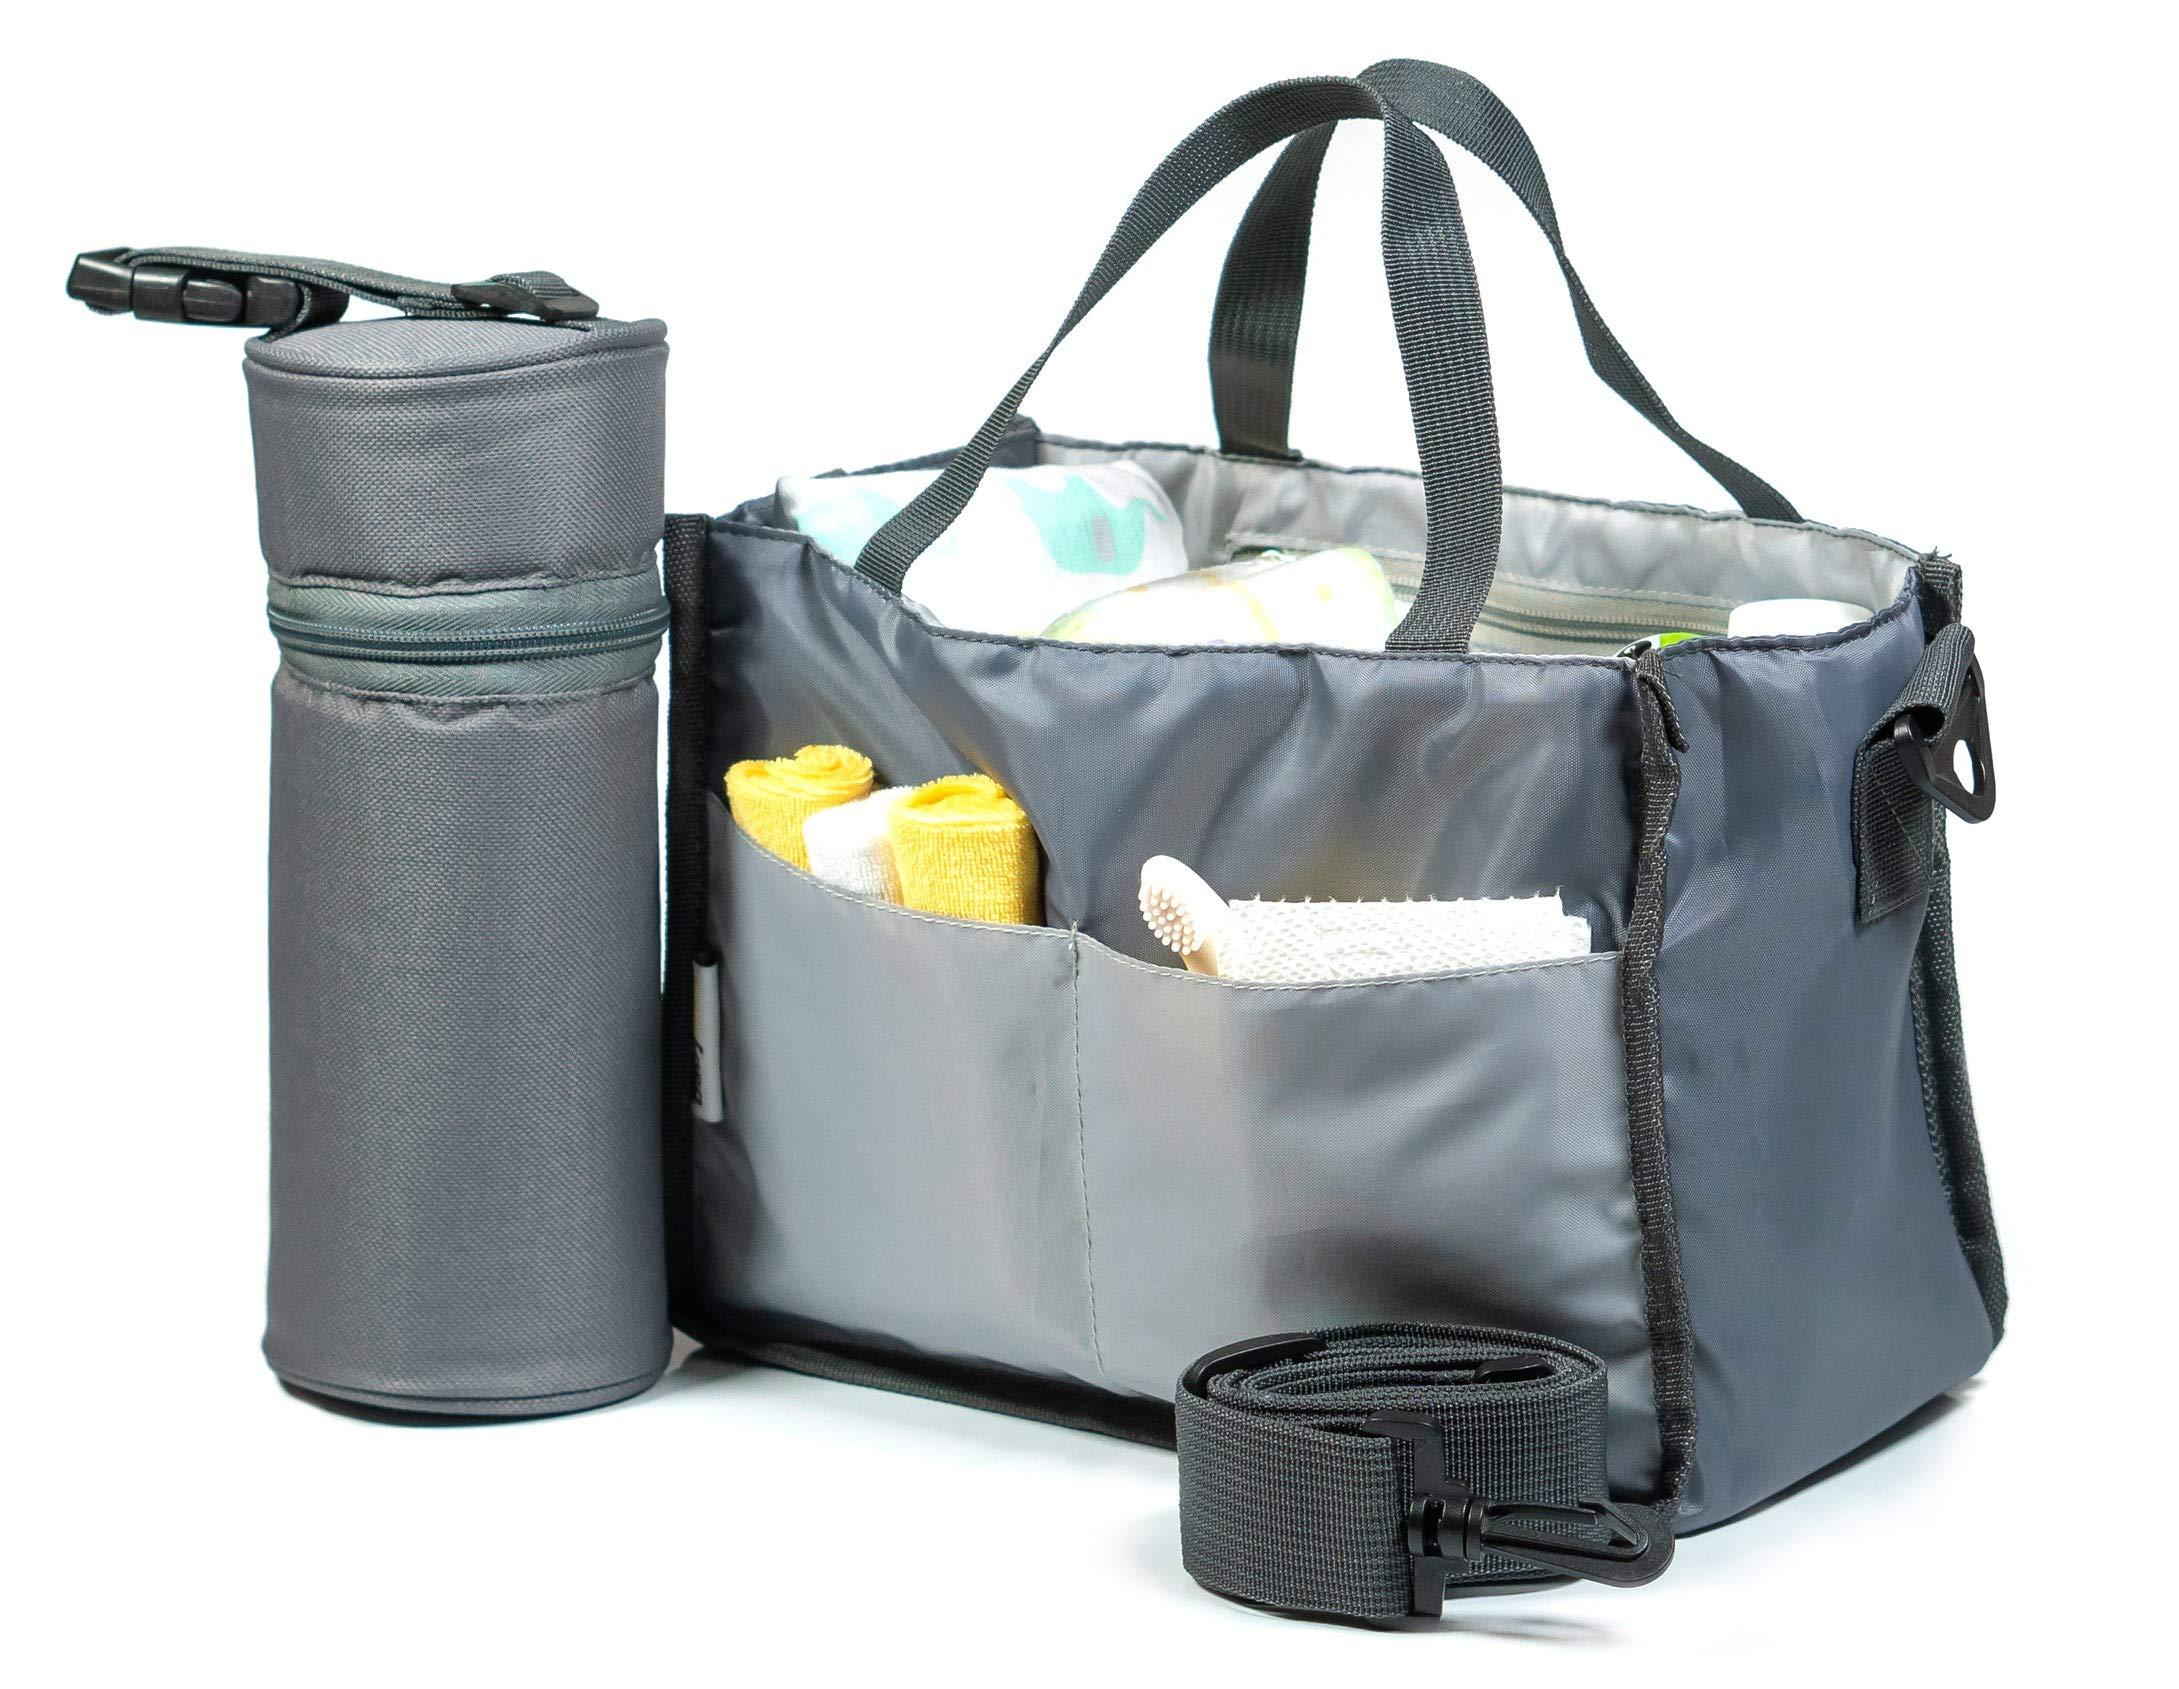 Organizer Backpack Included Sanitizer Smartphone